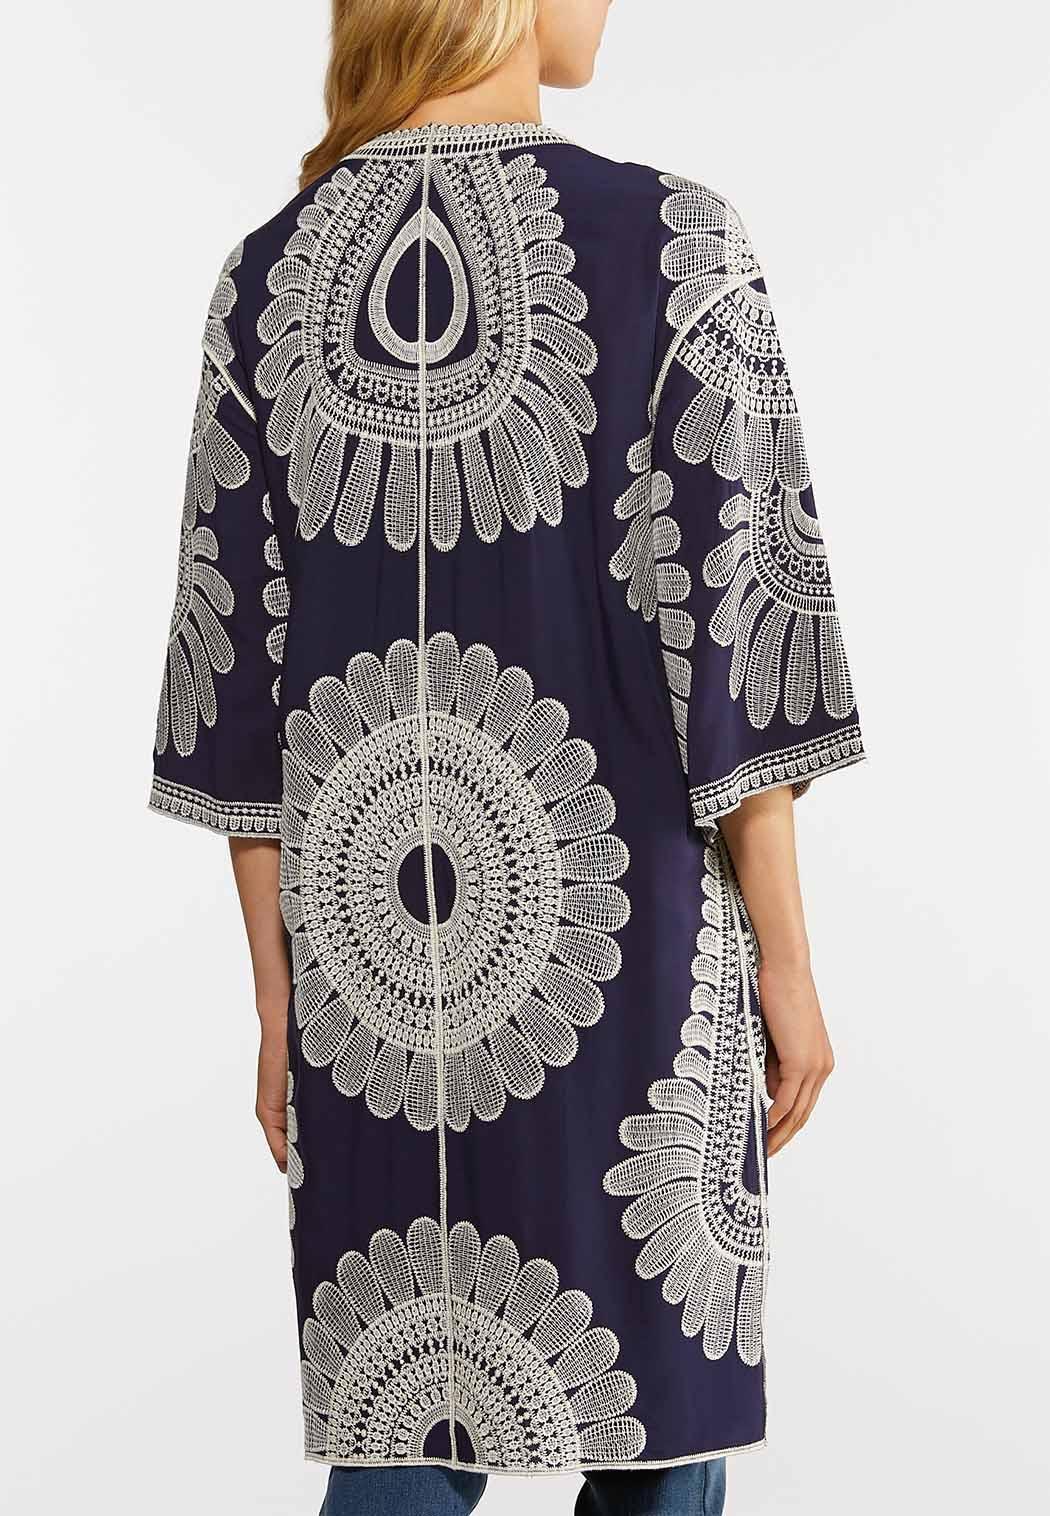 Embroidered Navy Kimono (Item #43987942)